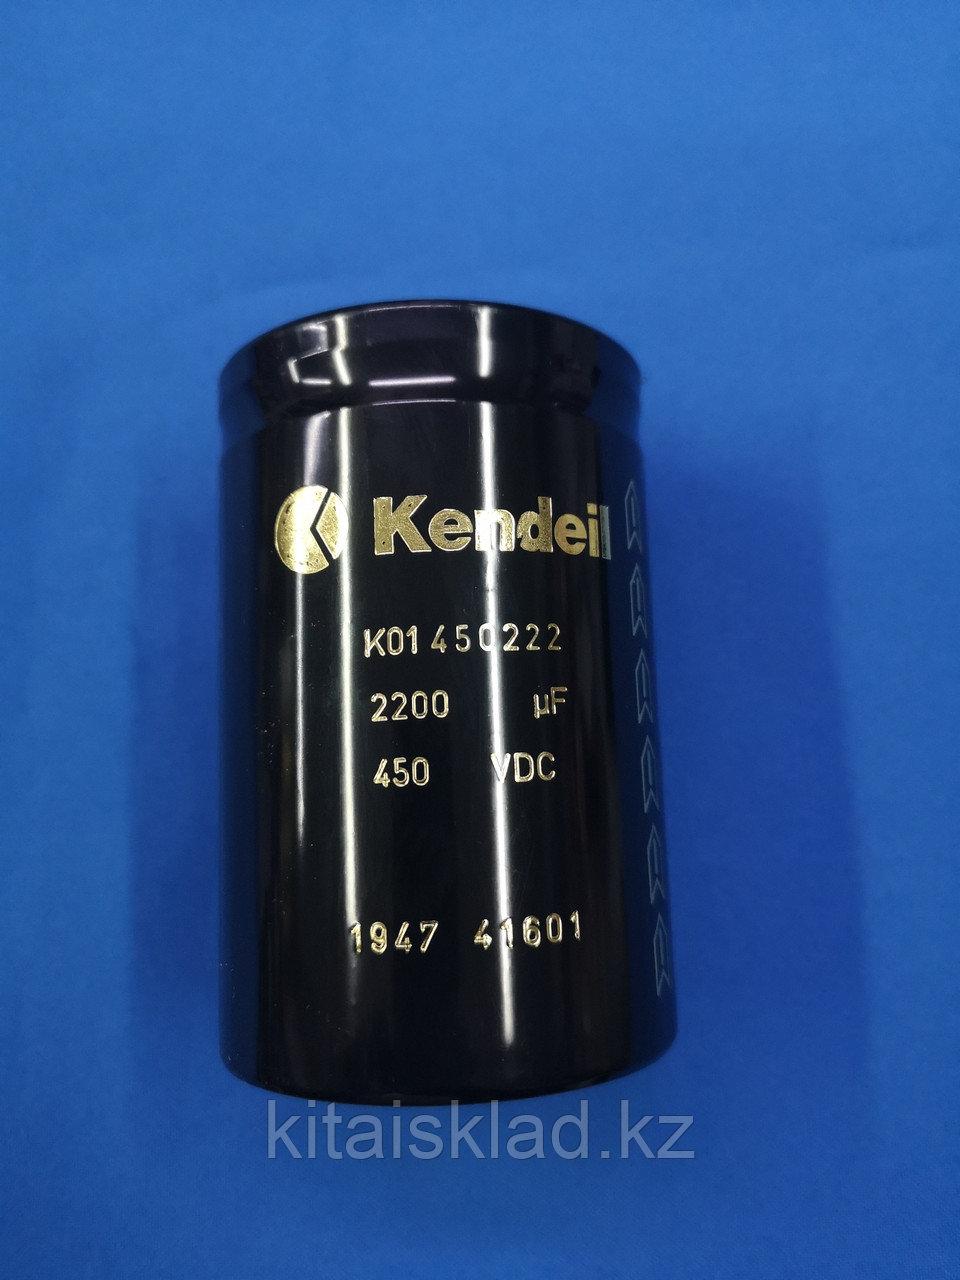 Конденсатор Kendeil K01450222 2200mF 450VDC